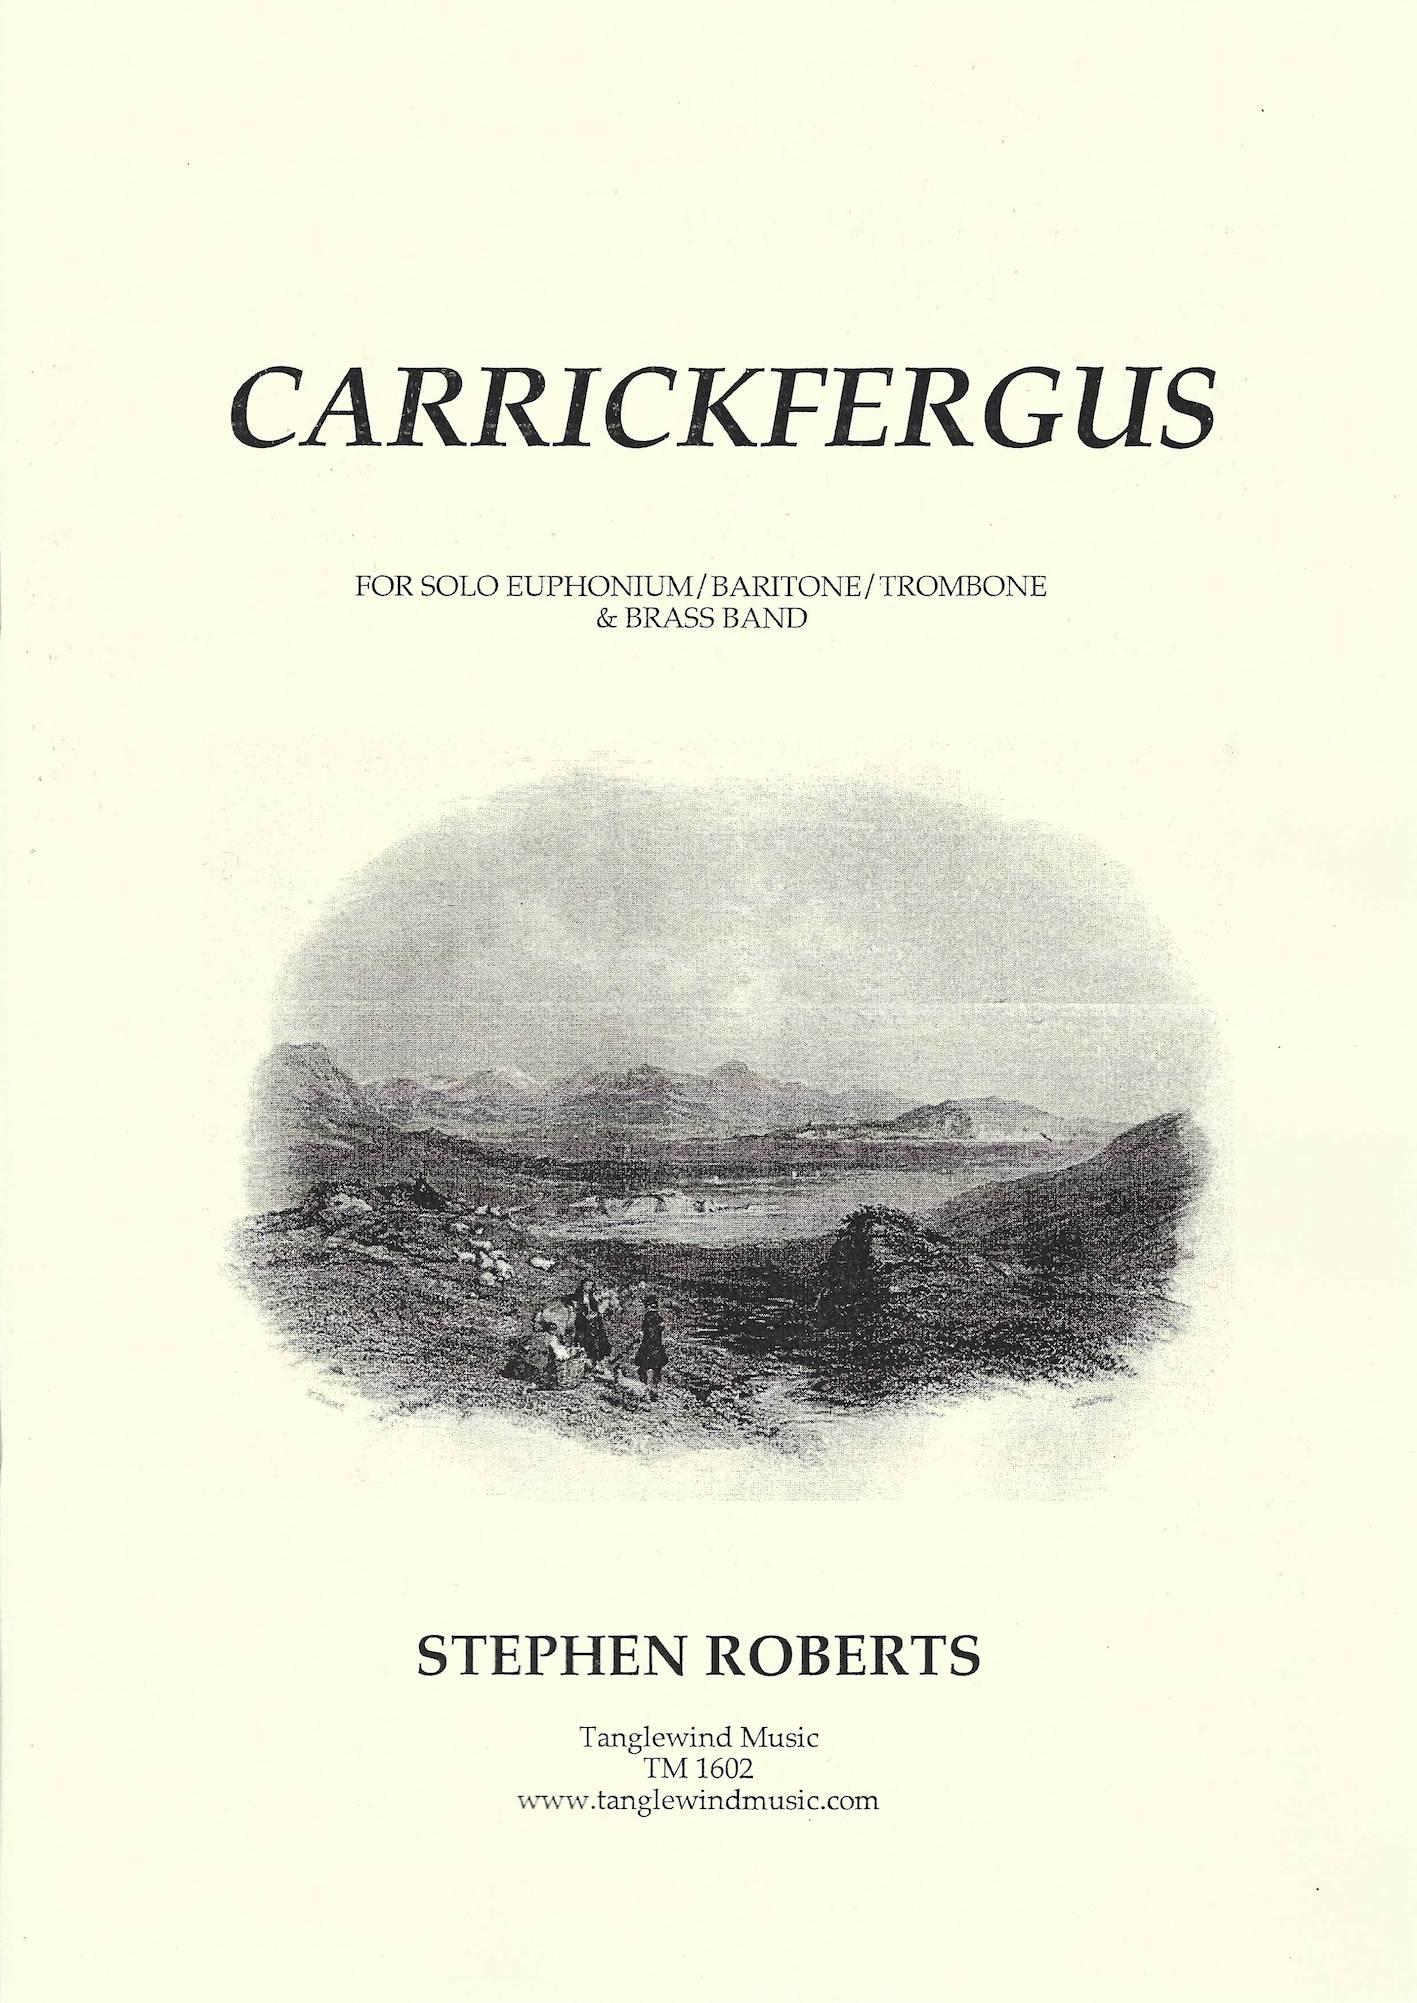 Carrickfergus - Trad. Irish Air Arr. Stephen Roberts - Euphonium (or baritone or trombone) and Brass Band